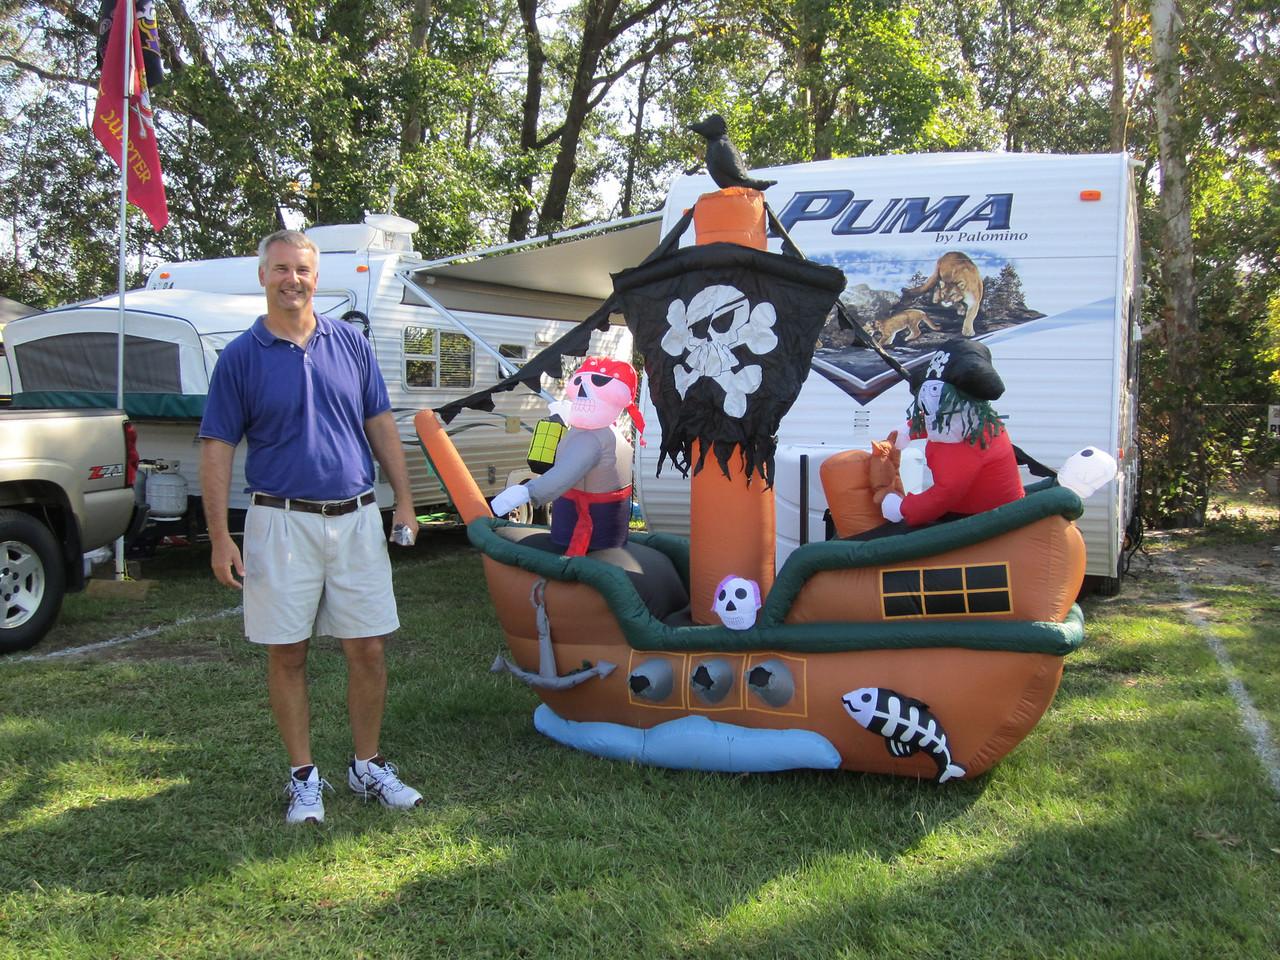 9/10/2011 ECU vs Virginia Tech  Jim and his pirate ship